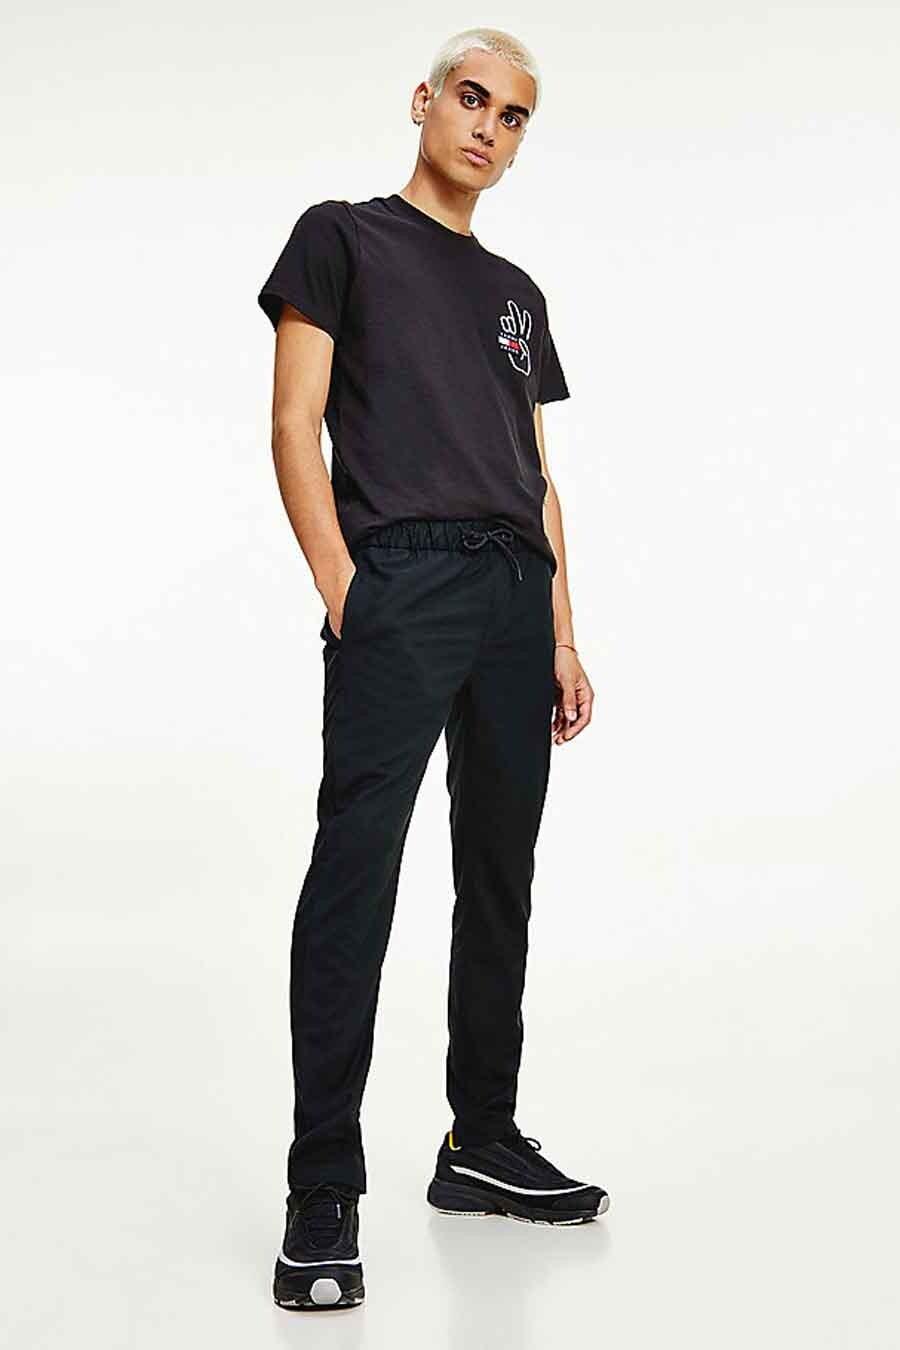 Tommy Jeans Jogging, Zwart, Heren, Maat: L/M/S/XL/XS